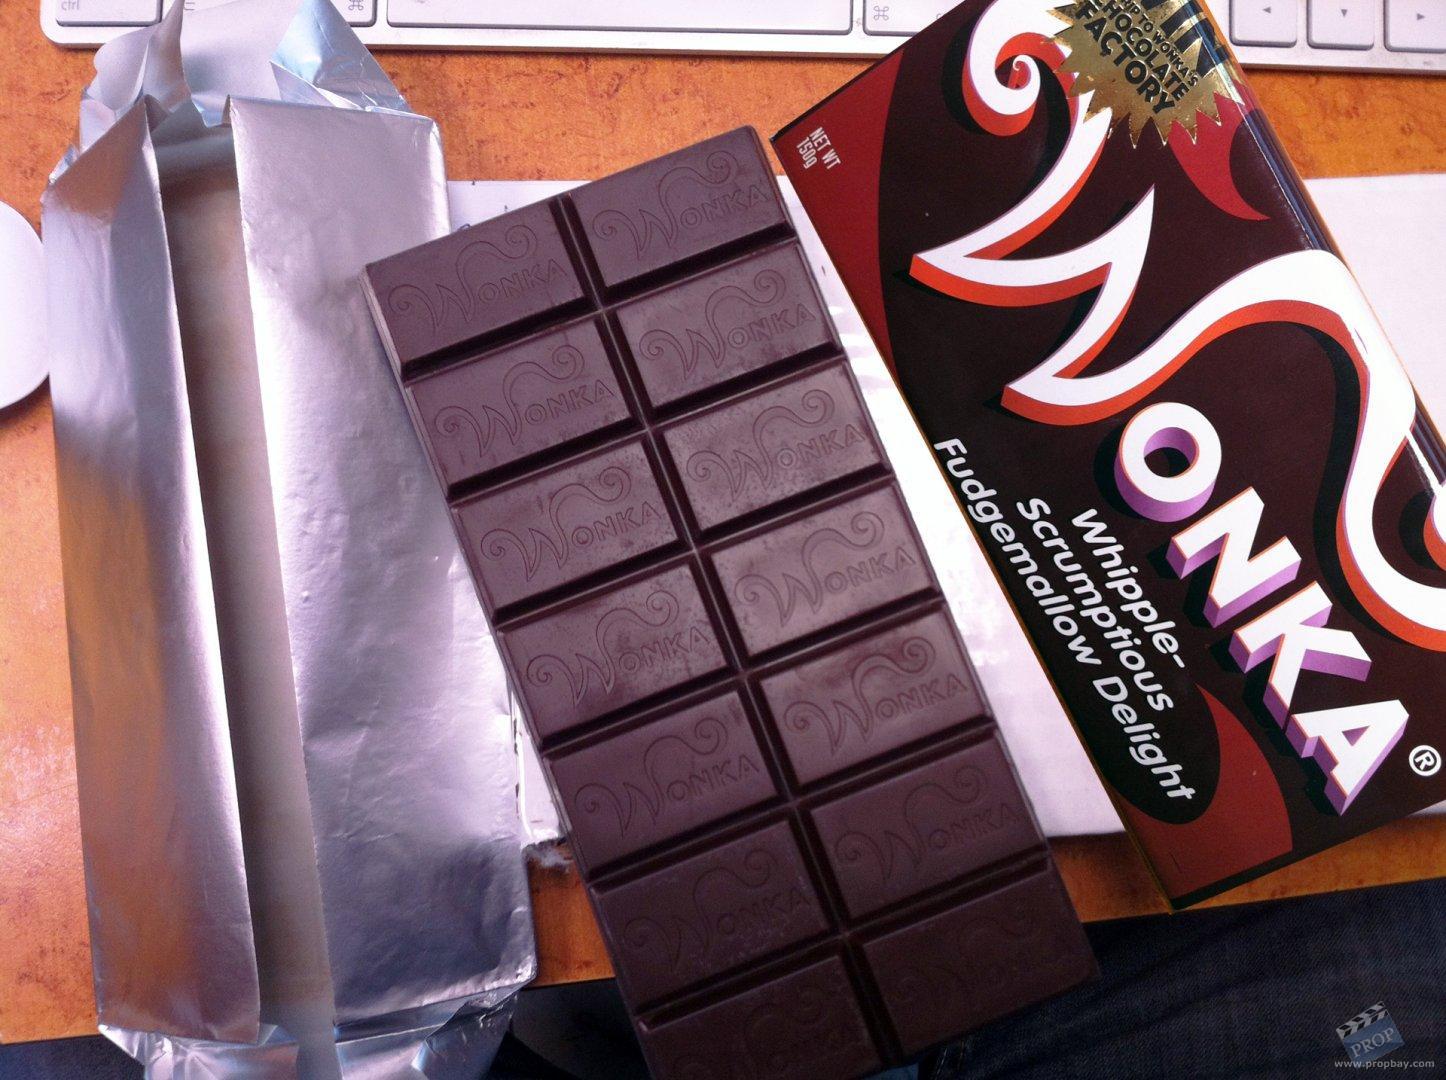 Wonka's 'Whipple-Scrumptious Fudgemallow Delight' Hero Chocolate ...